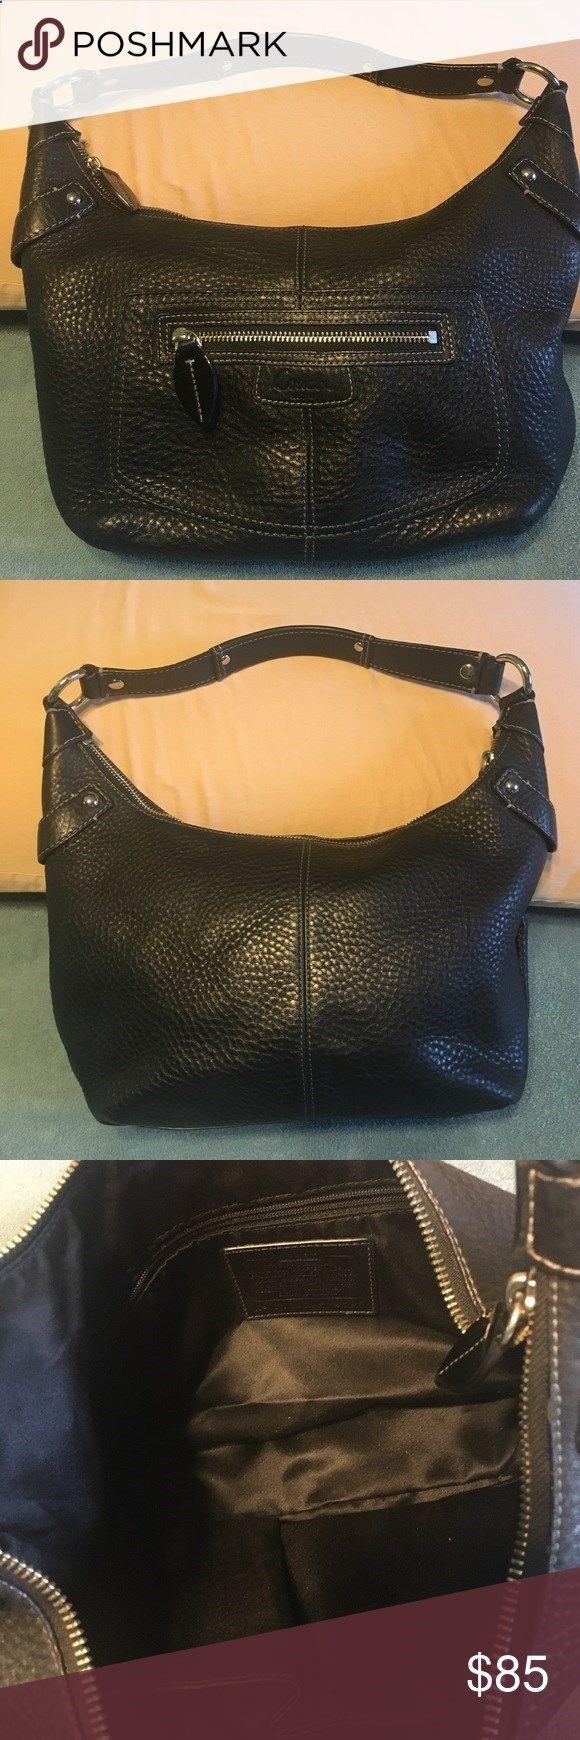 Black Coach Purse Leather Coach purse in black. Pebble texture. Silver trim. Very clean, excellent condition. Coach Bags Shoulder Bags